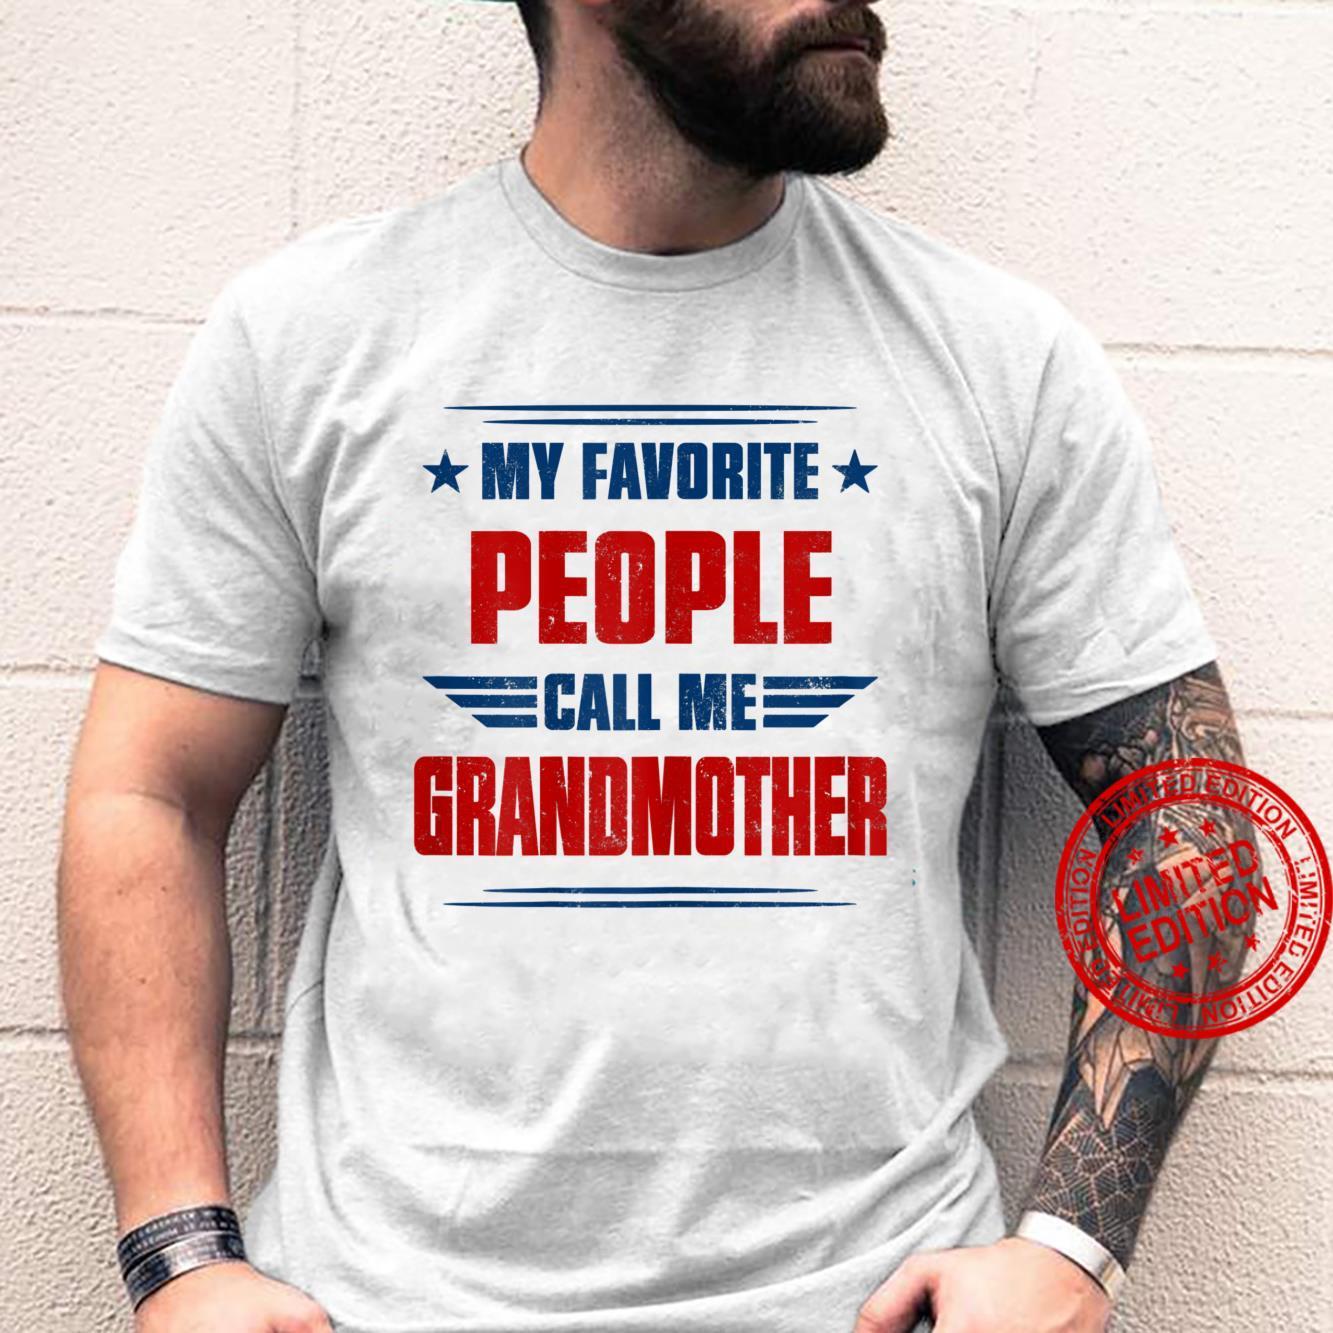 Womens People Call Me Grandmother Awesome Shirt